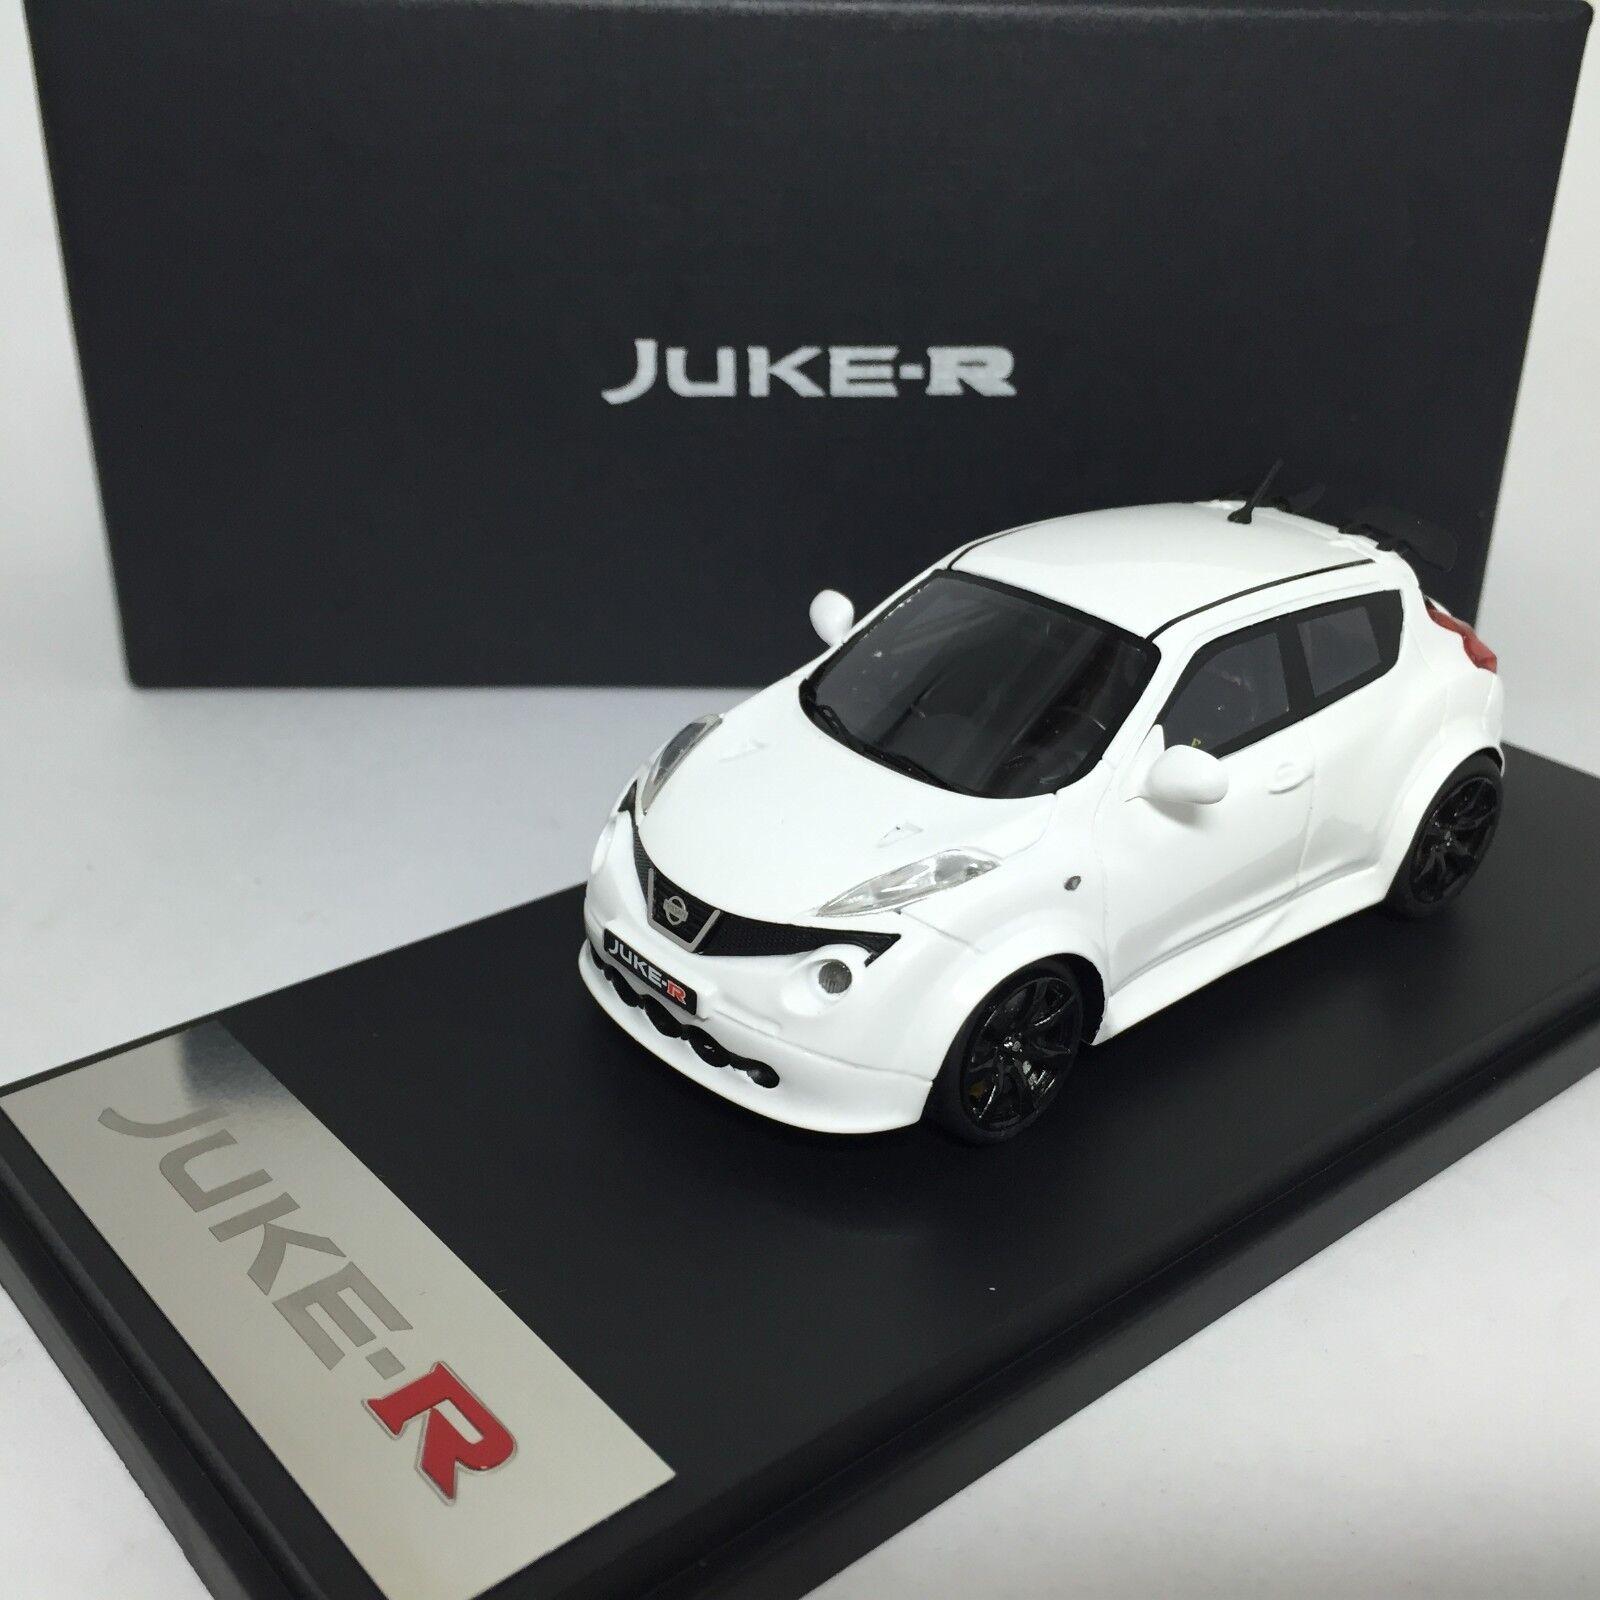 1/43 Mark Nissan NISMO JUKE-R White 2013 Resin Ltd 100pcs